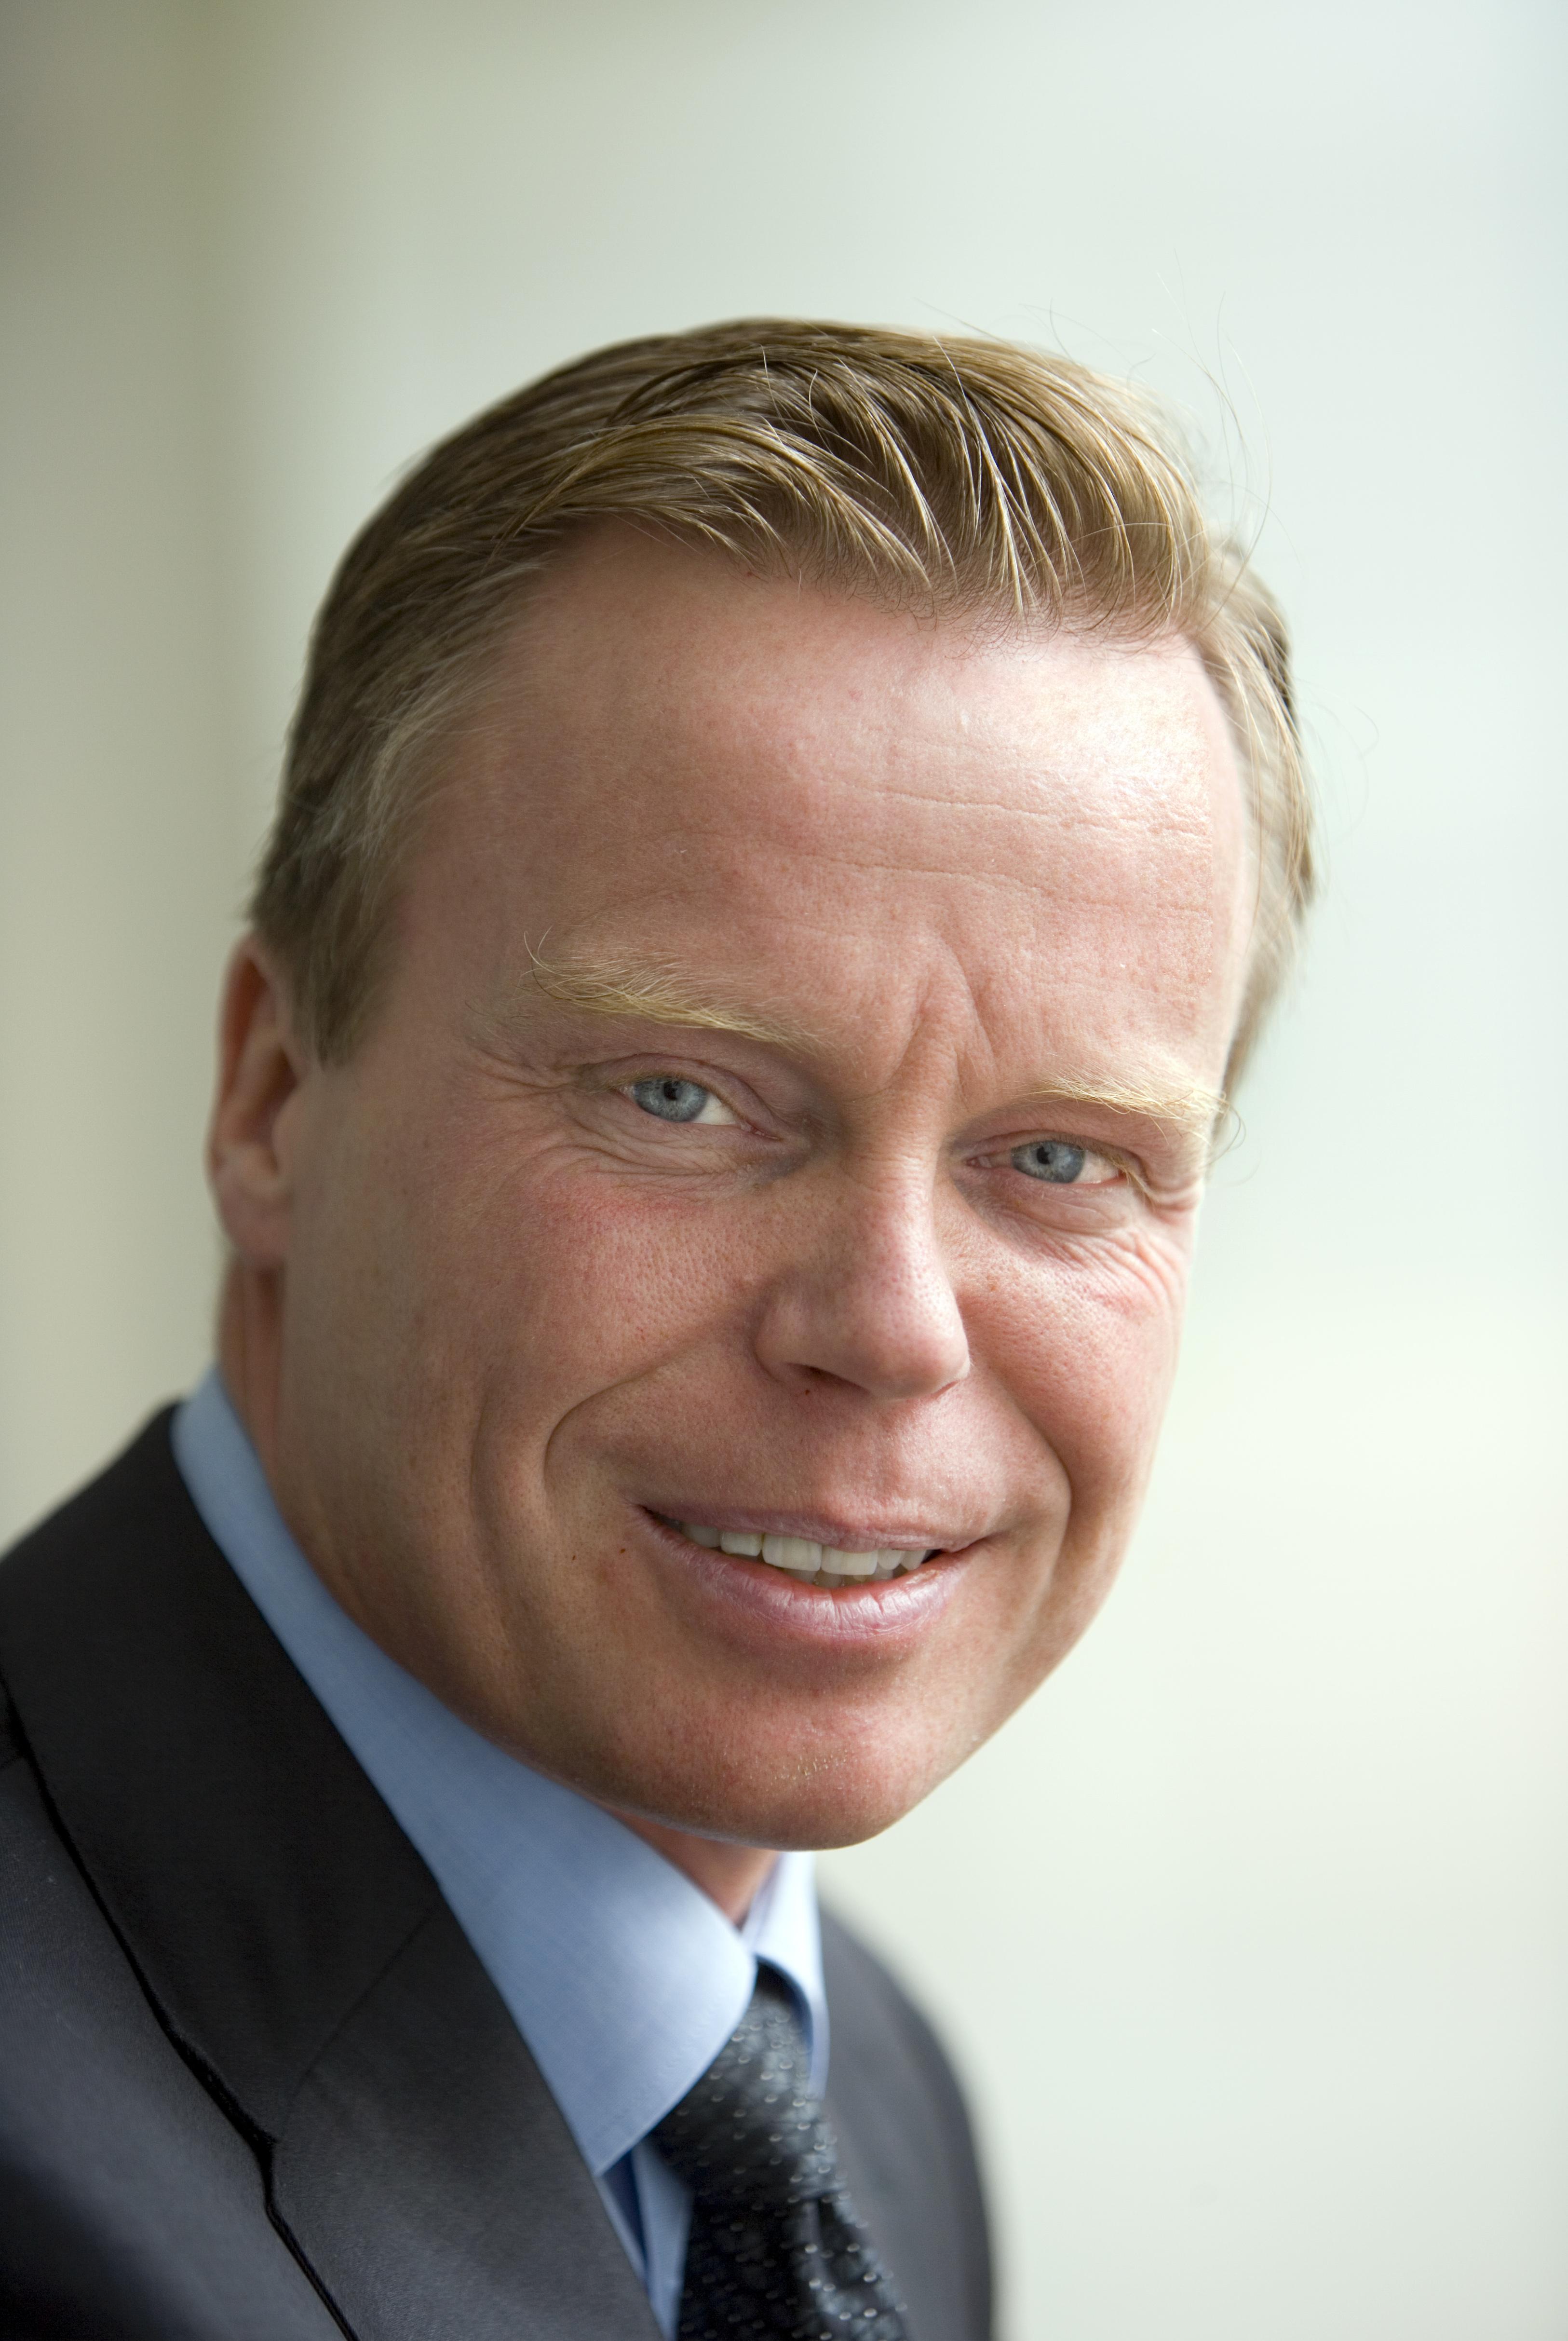 Eirik Pedersen, MD Proact IT Norge AS